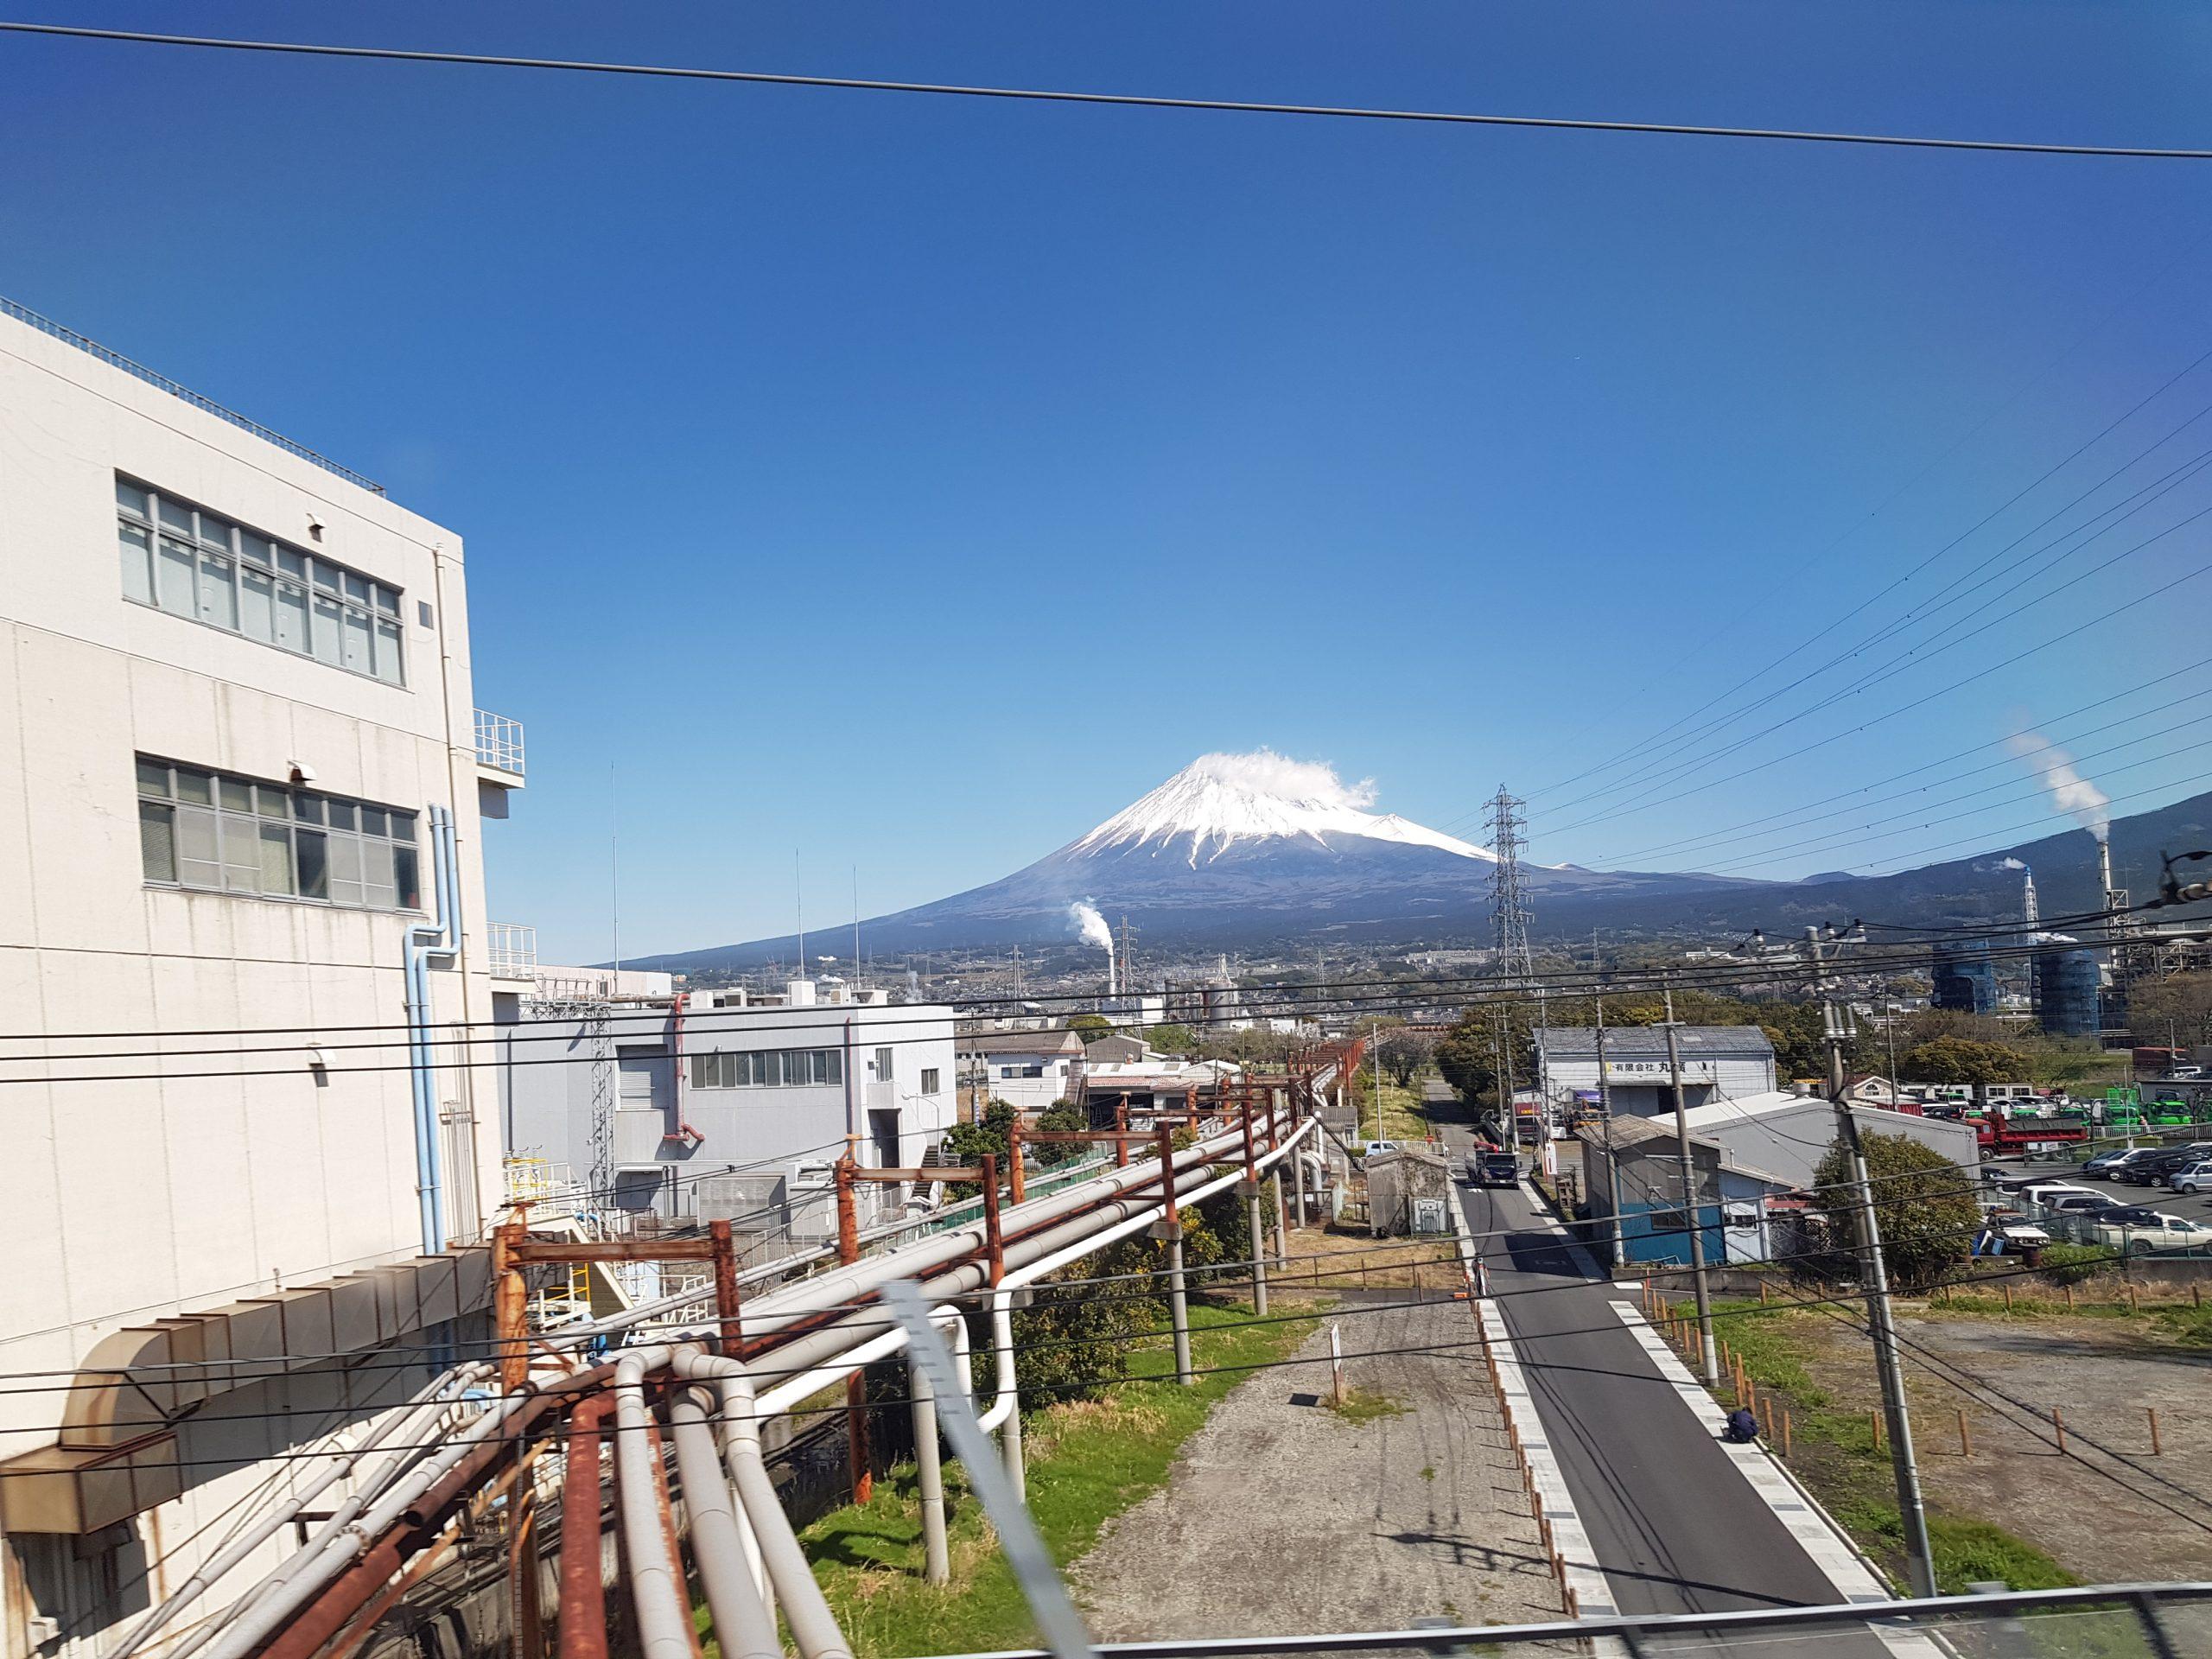 Fujisan, Japan